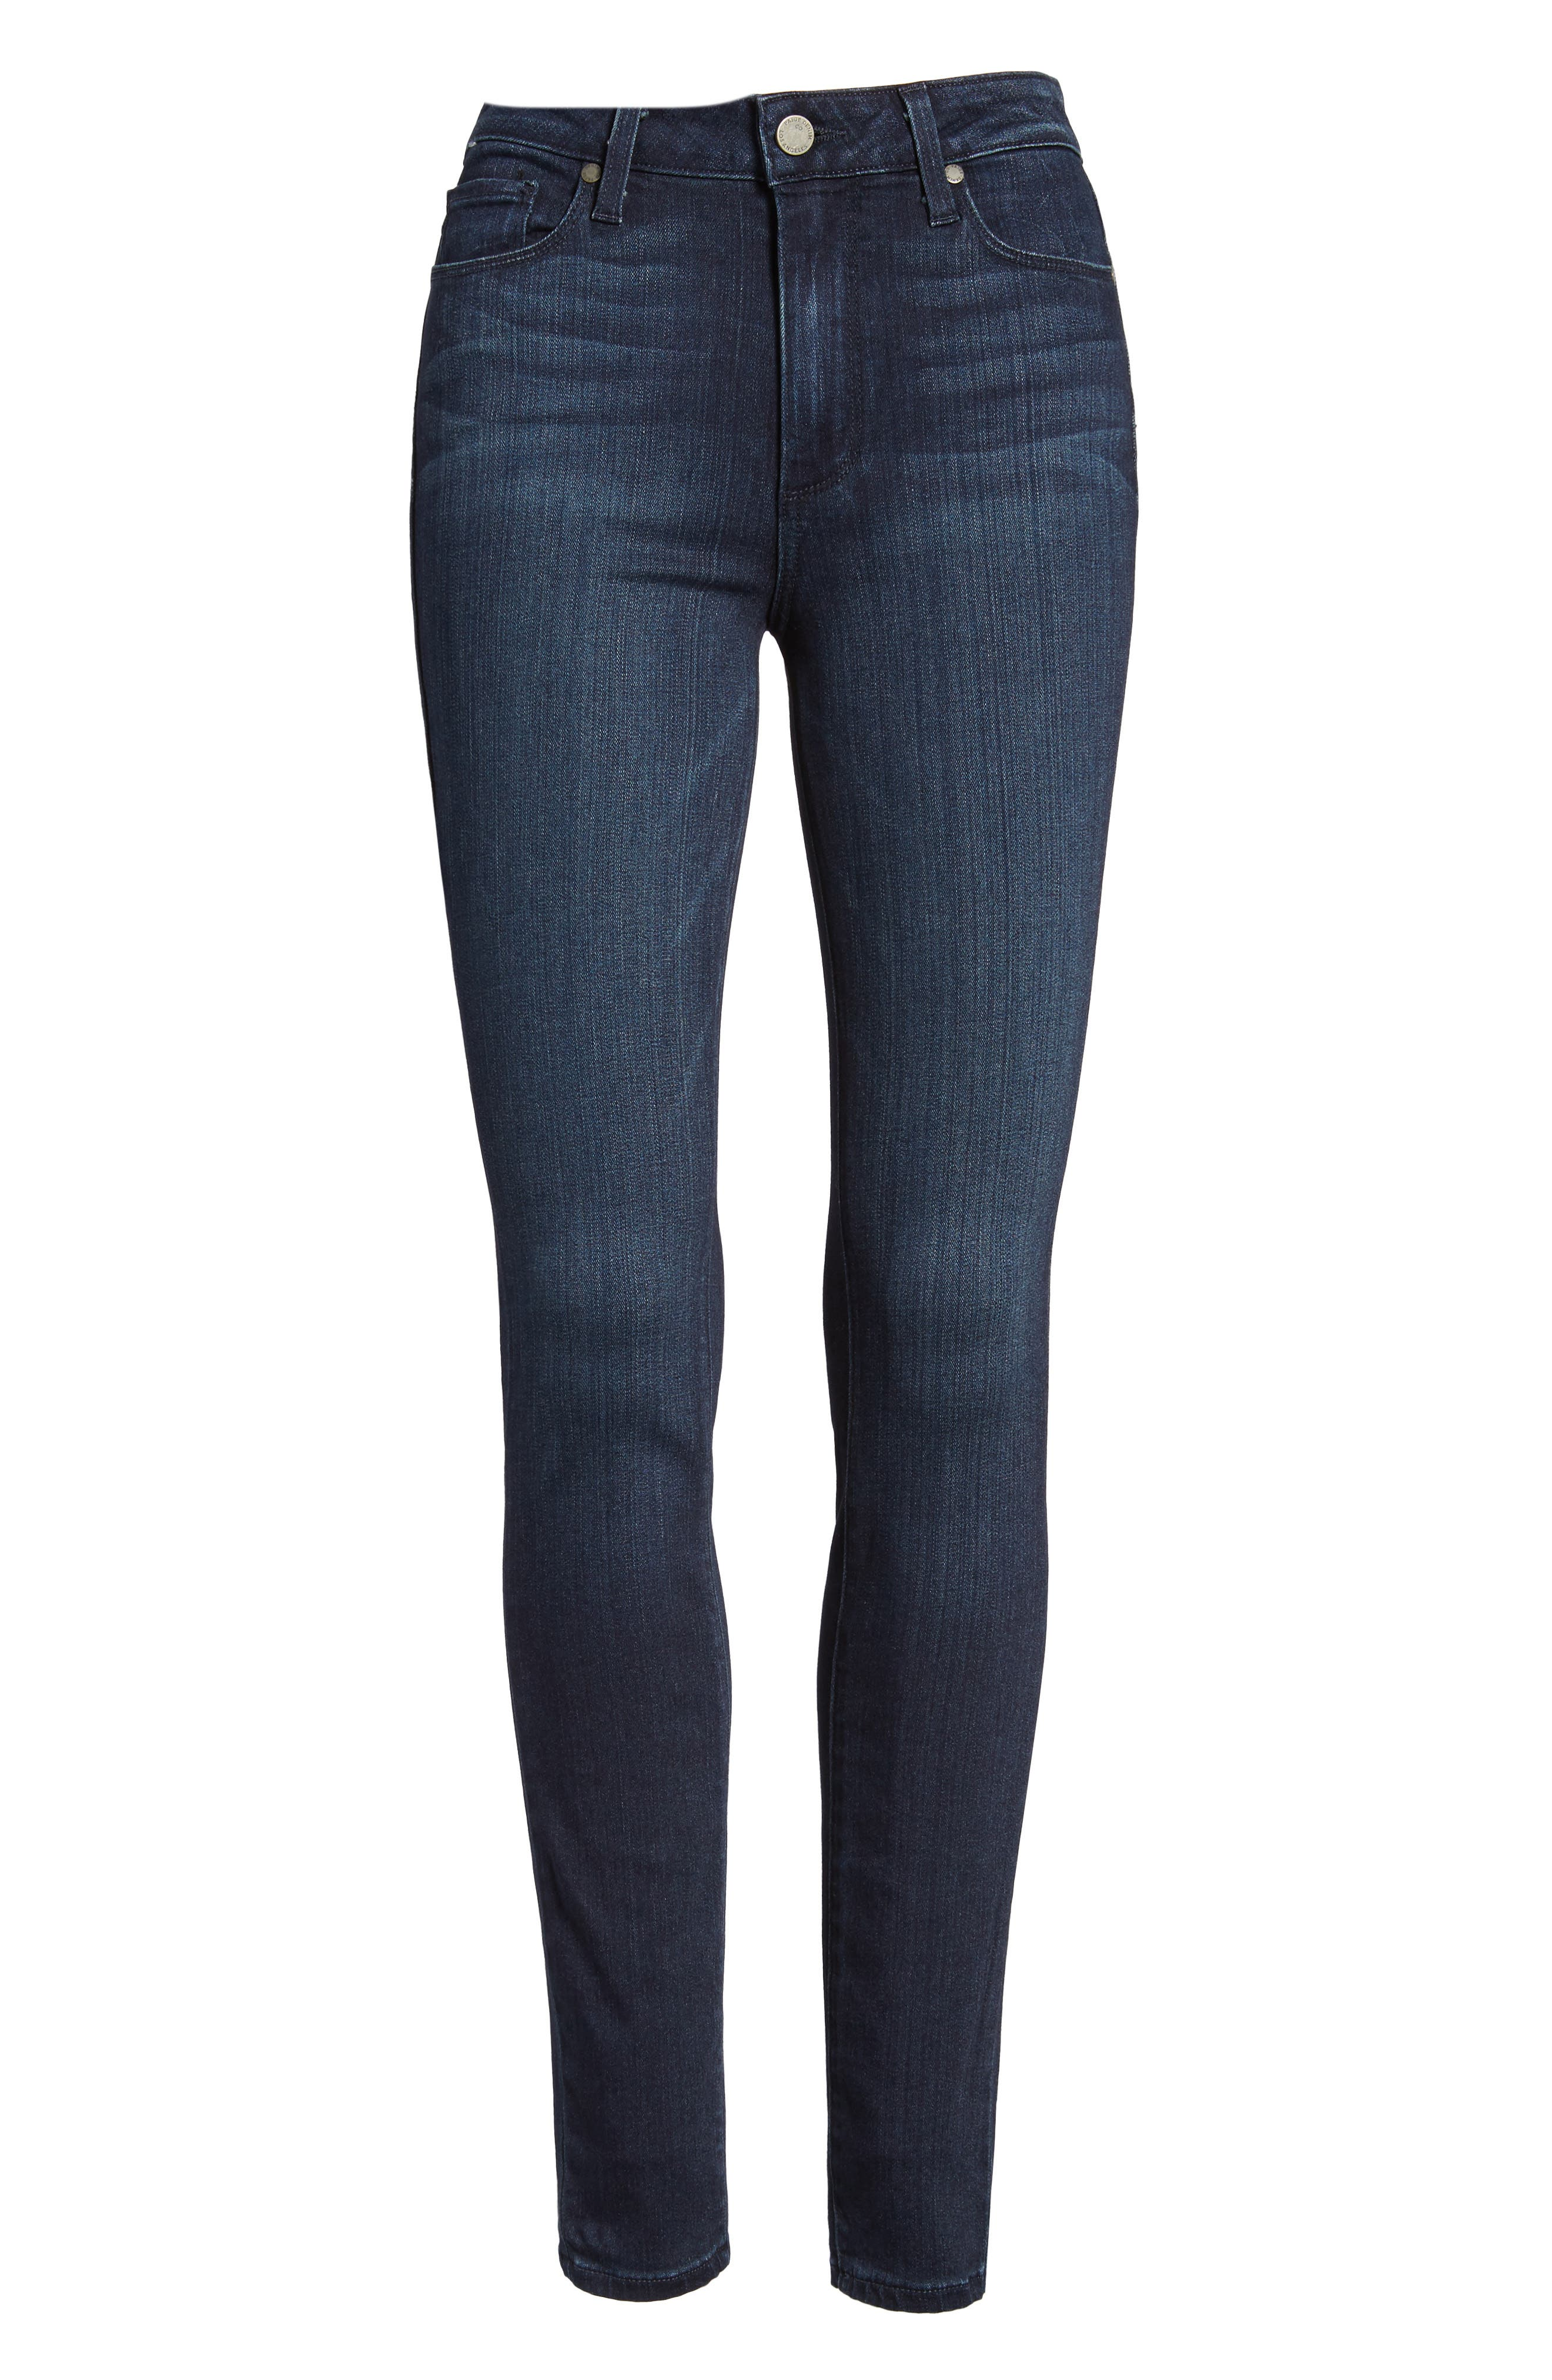 Transcend - Hoxton High Waist Ultra Skinny Jeans,                             Alternate thumbnail 7, color,                             400